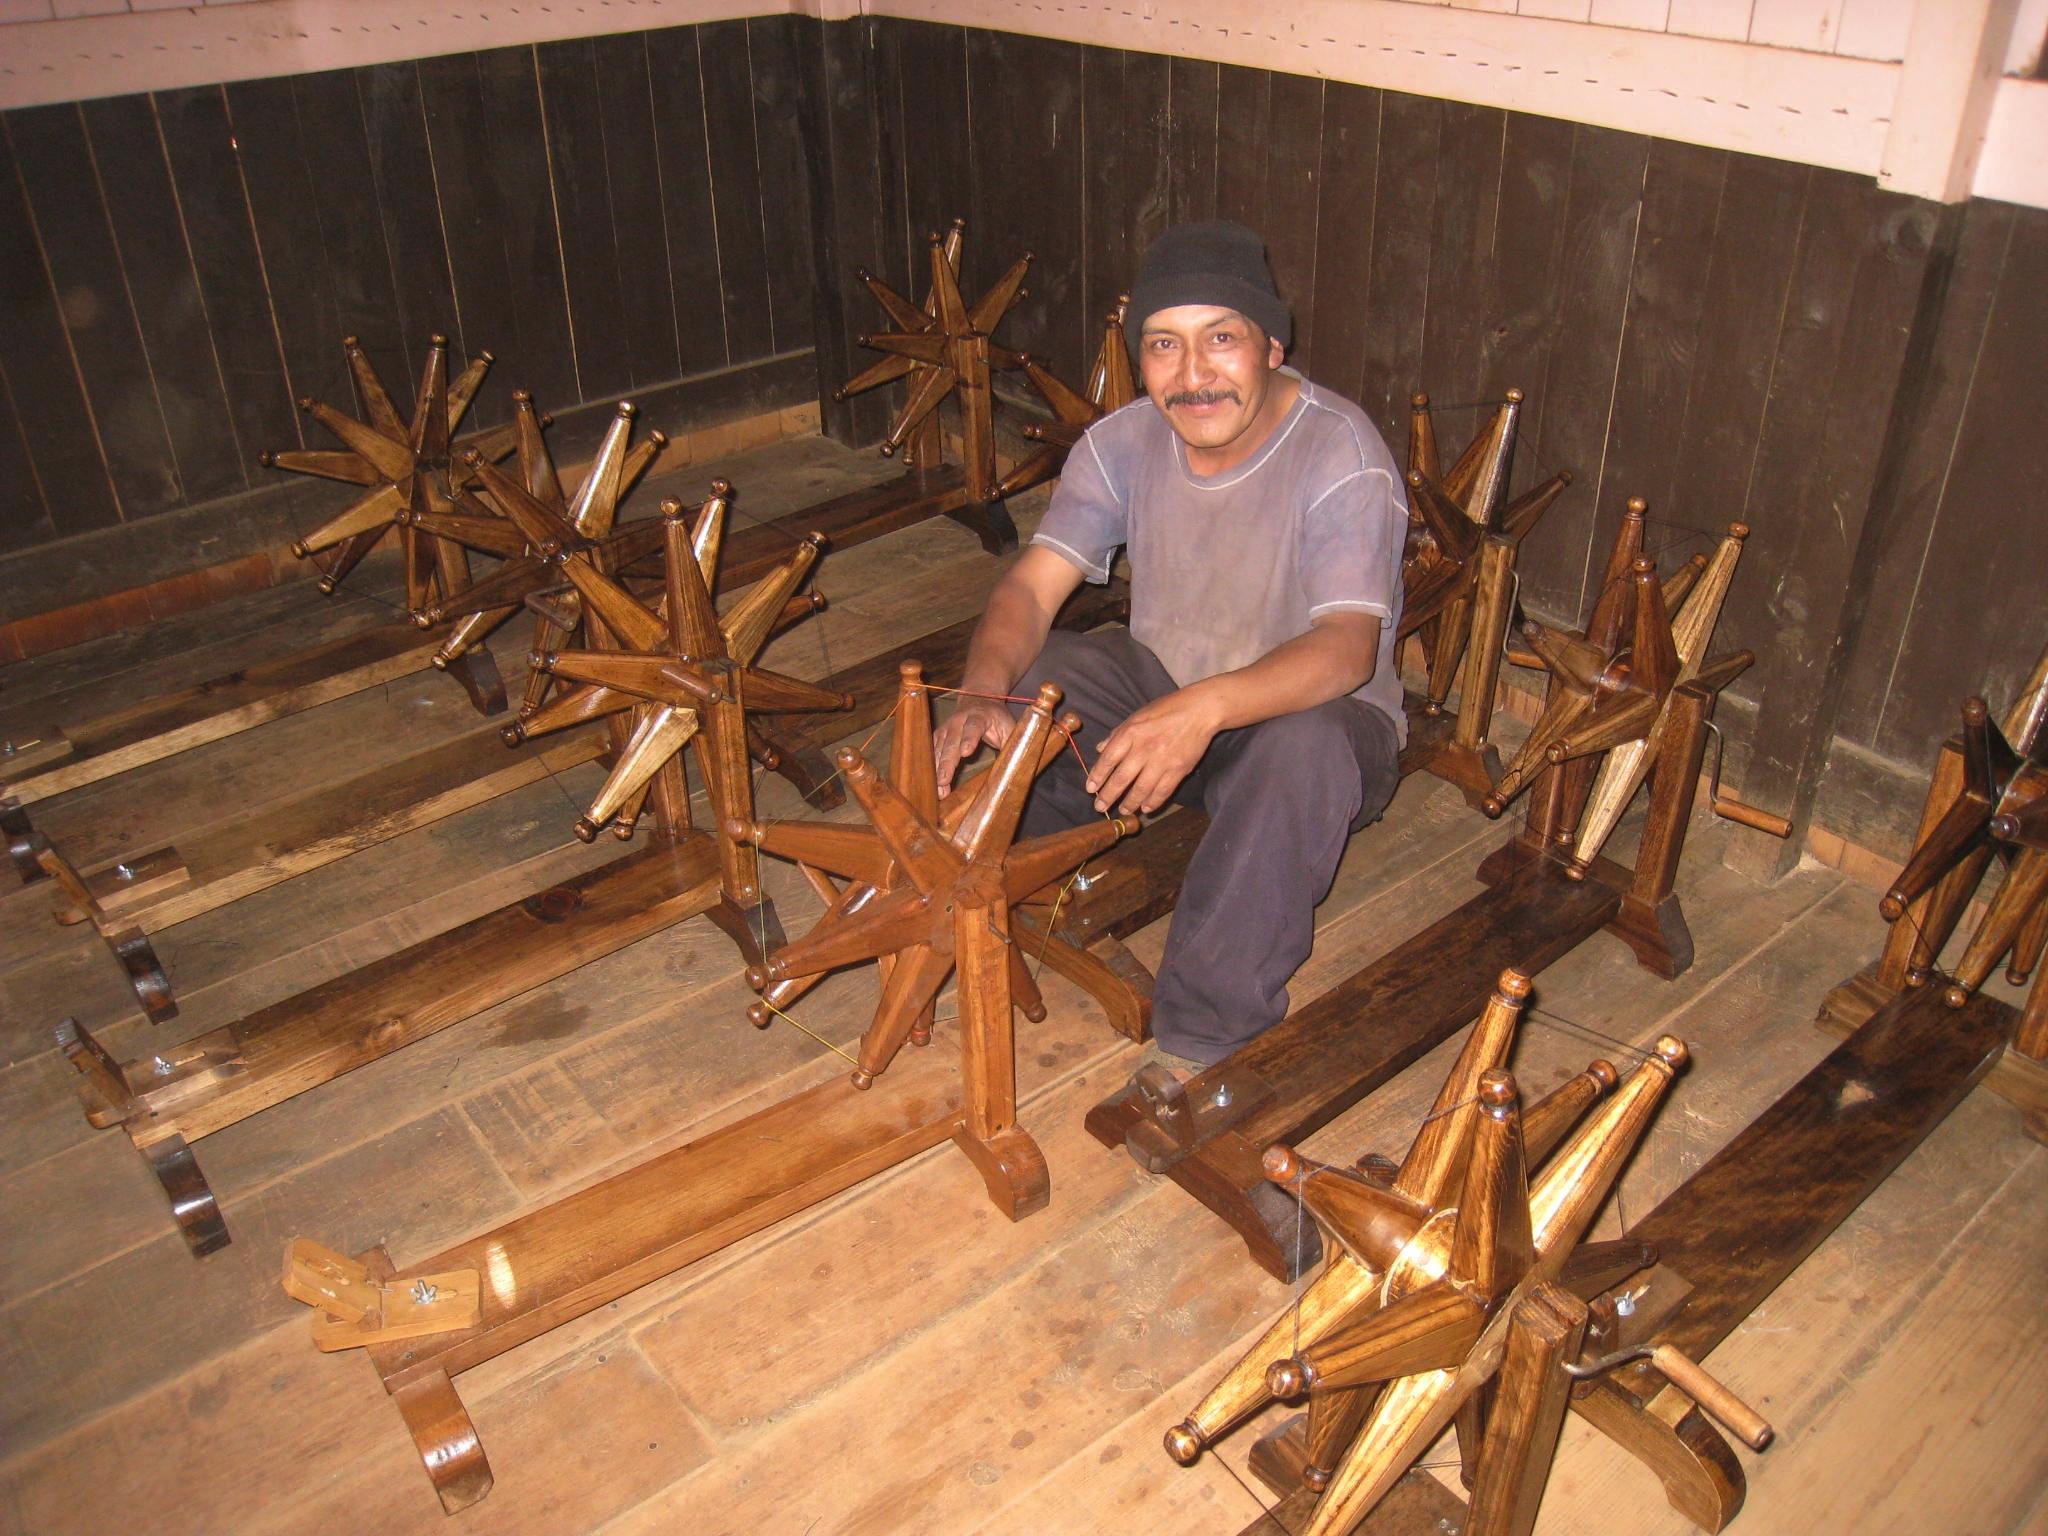 Spinning wheel created by Ghandi